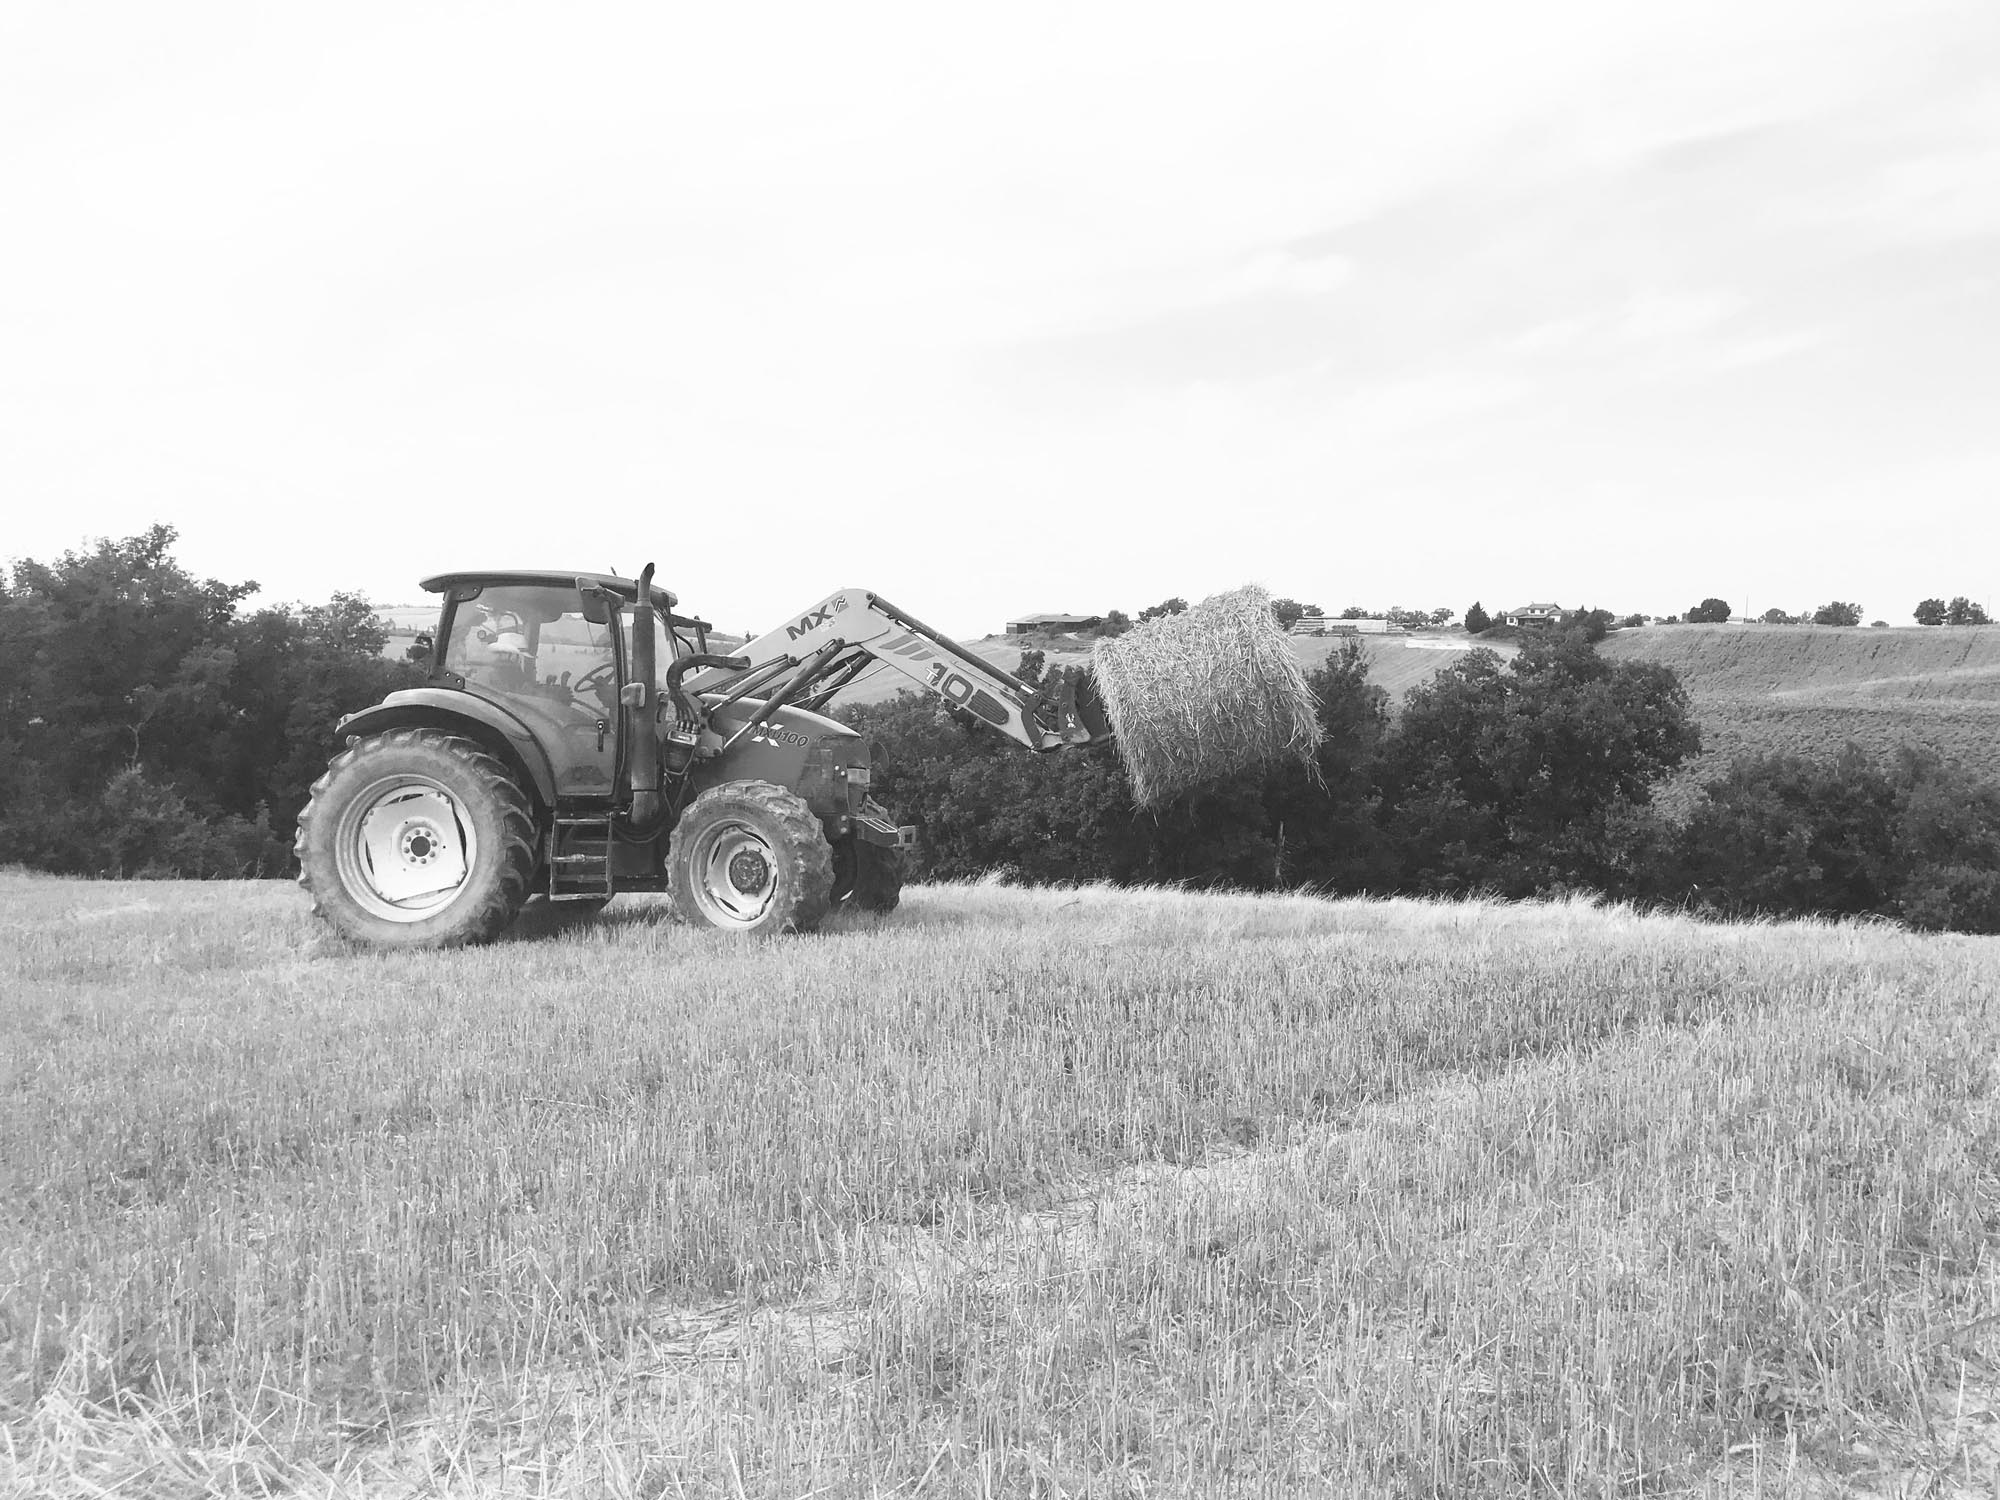 ferme-de-peyrot-vente-direct-viande-bovine-montgazin-haute-garonne-occitanieNB